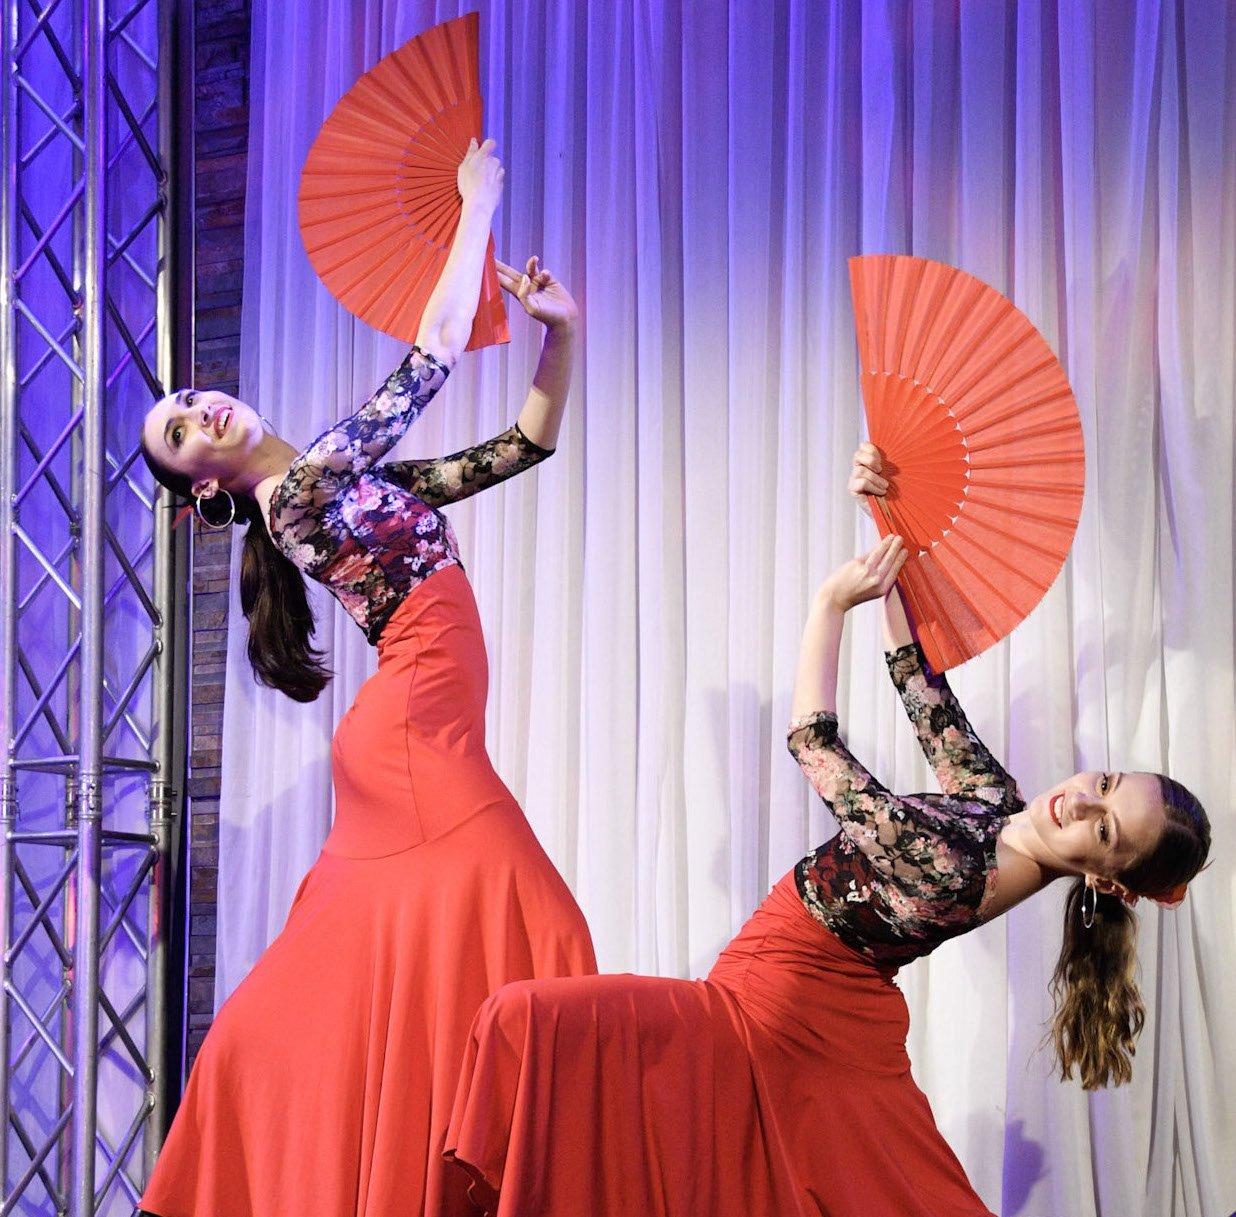 Awards Night Dancers